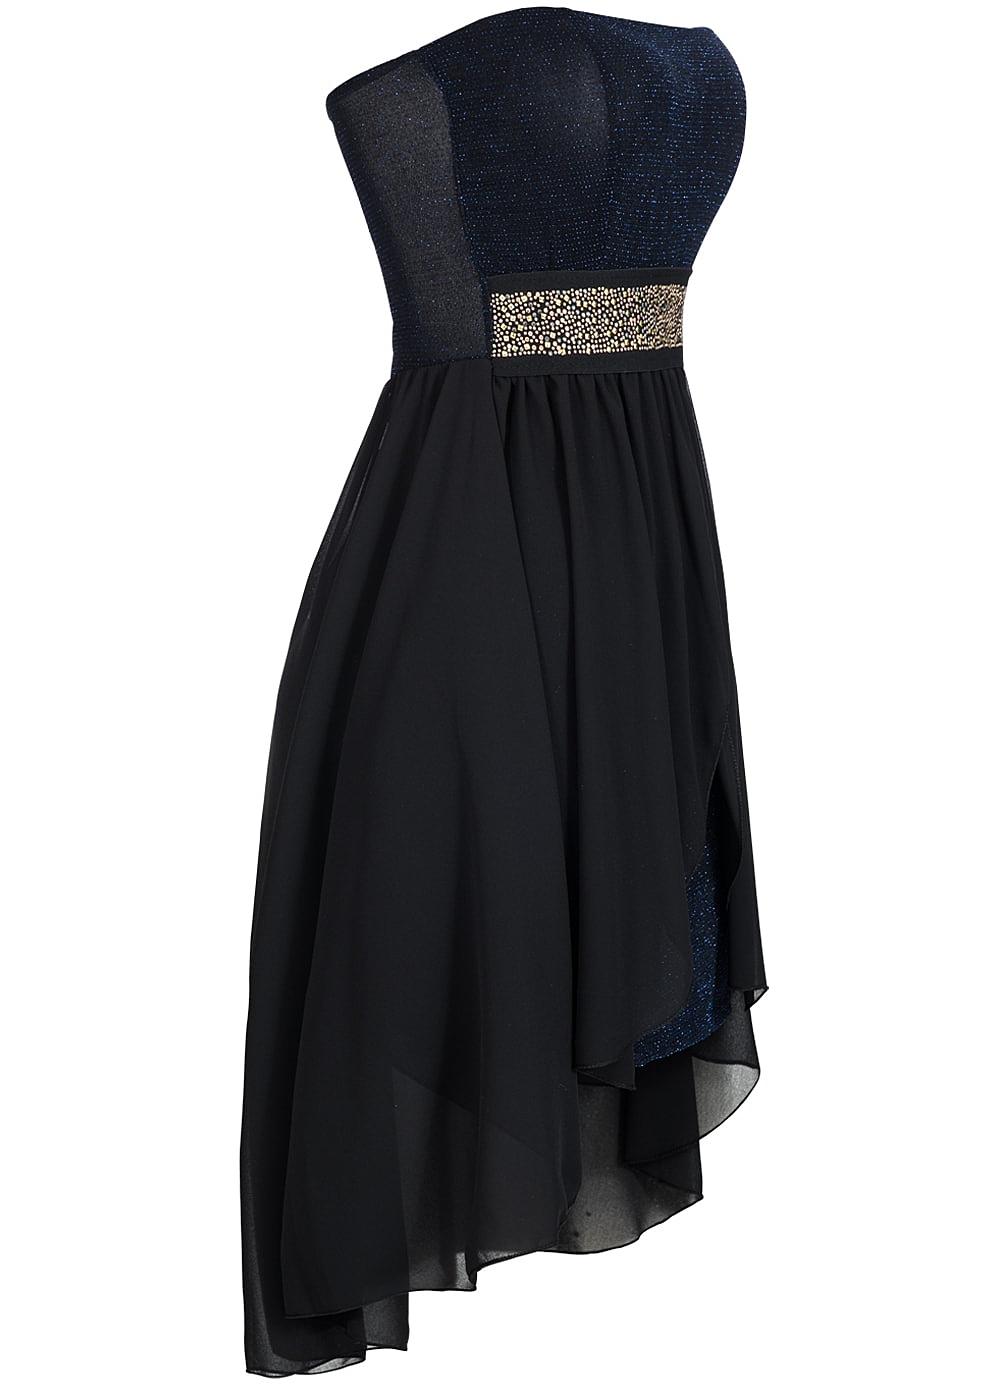 118827e3d01e53 Styleboom Fashion Damen Party Bandeau Kleid Vokuhila Glitzer ...